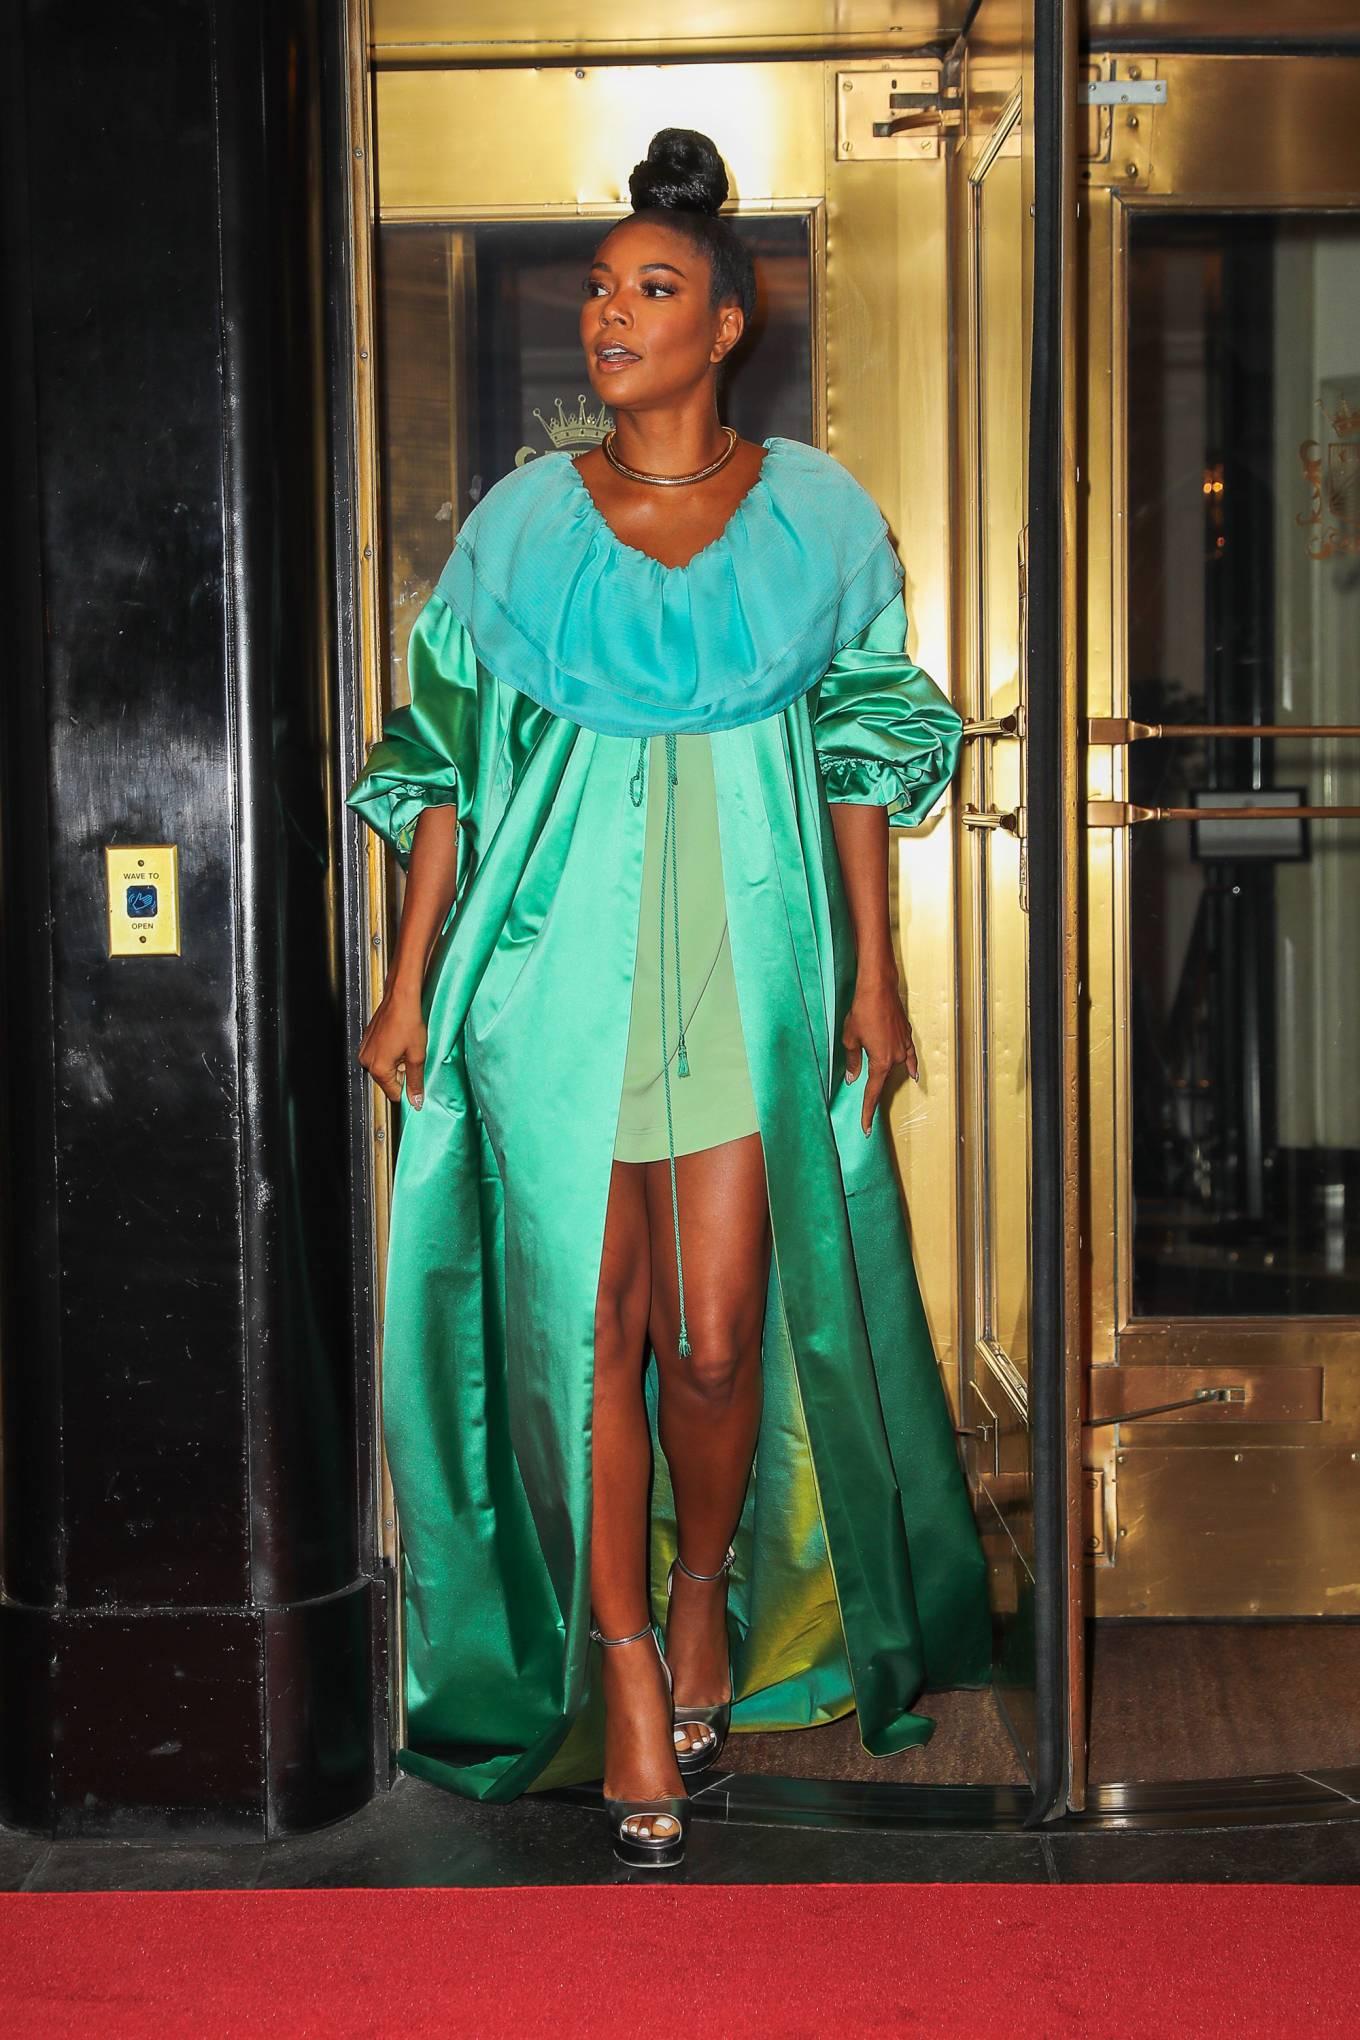 Gabrielle Union 2021 : Gabrielle Union – Seen in a green dress in New York-08